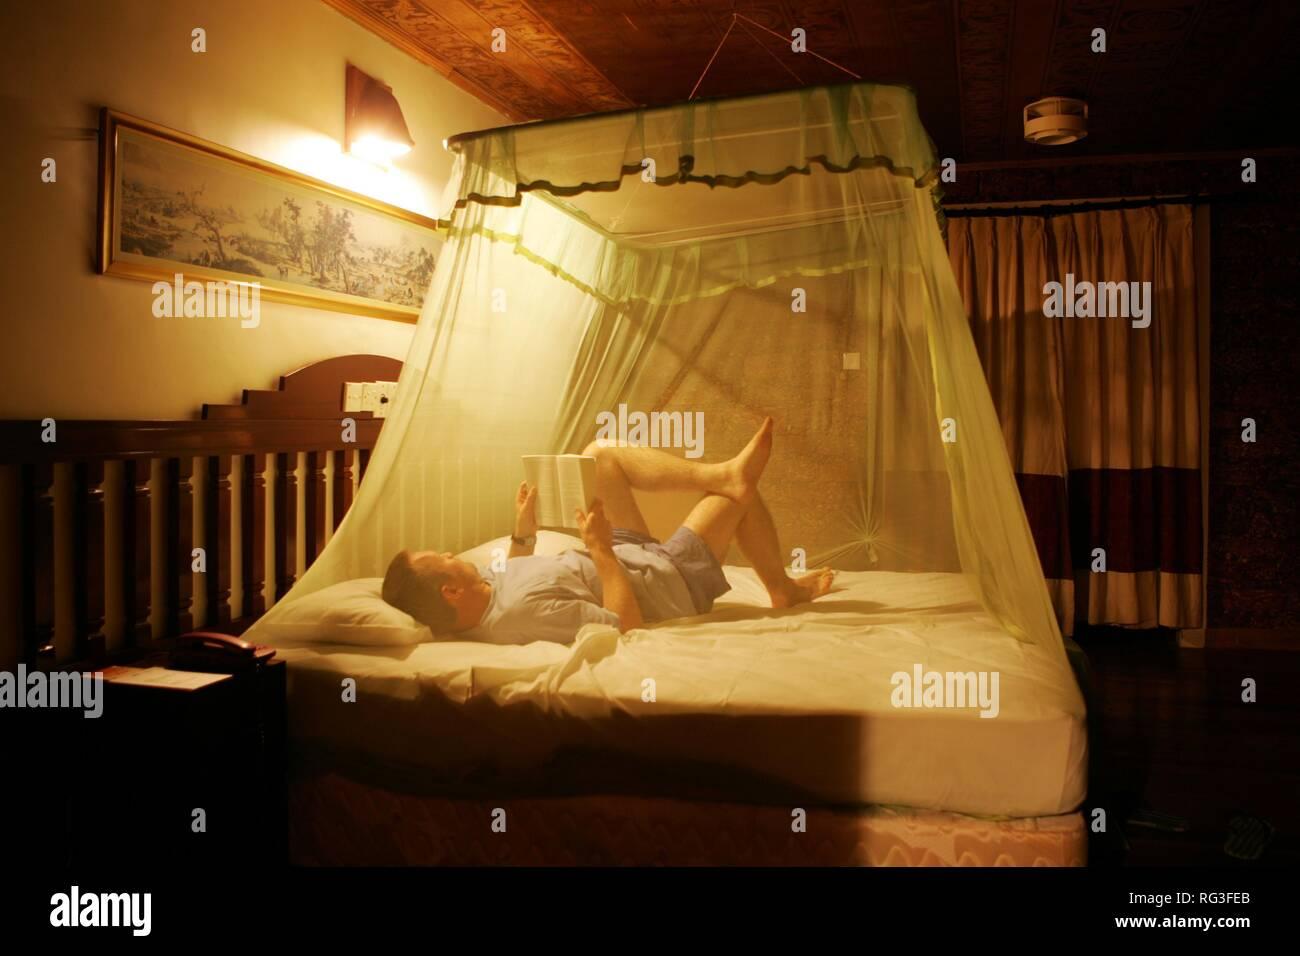 LKA, Sri Lanka : Siddhalepa Ayurveda Resort , hotel room with mosquito net. Stock Photo